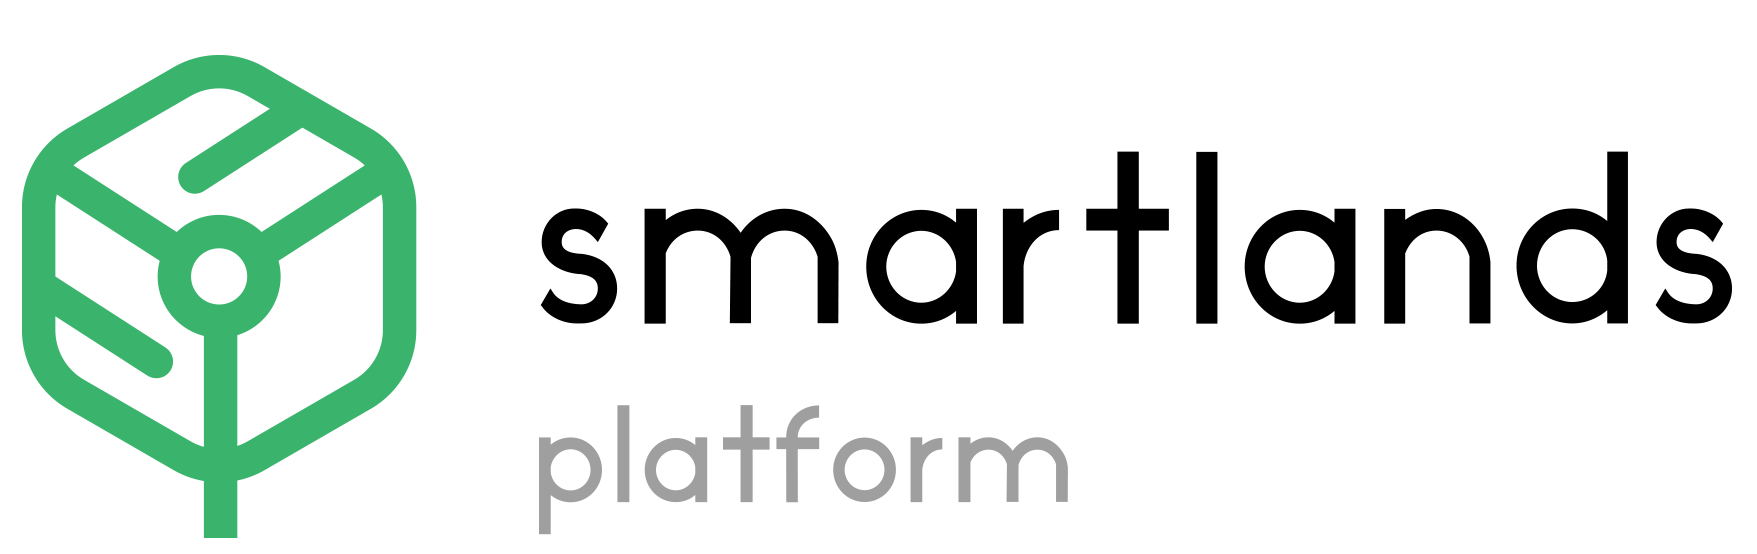 Smartlands Platform